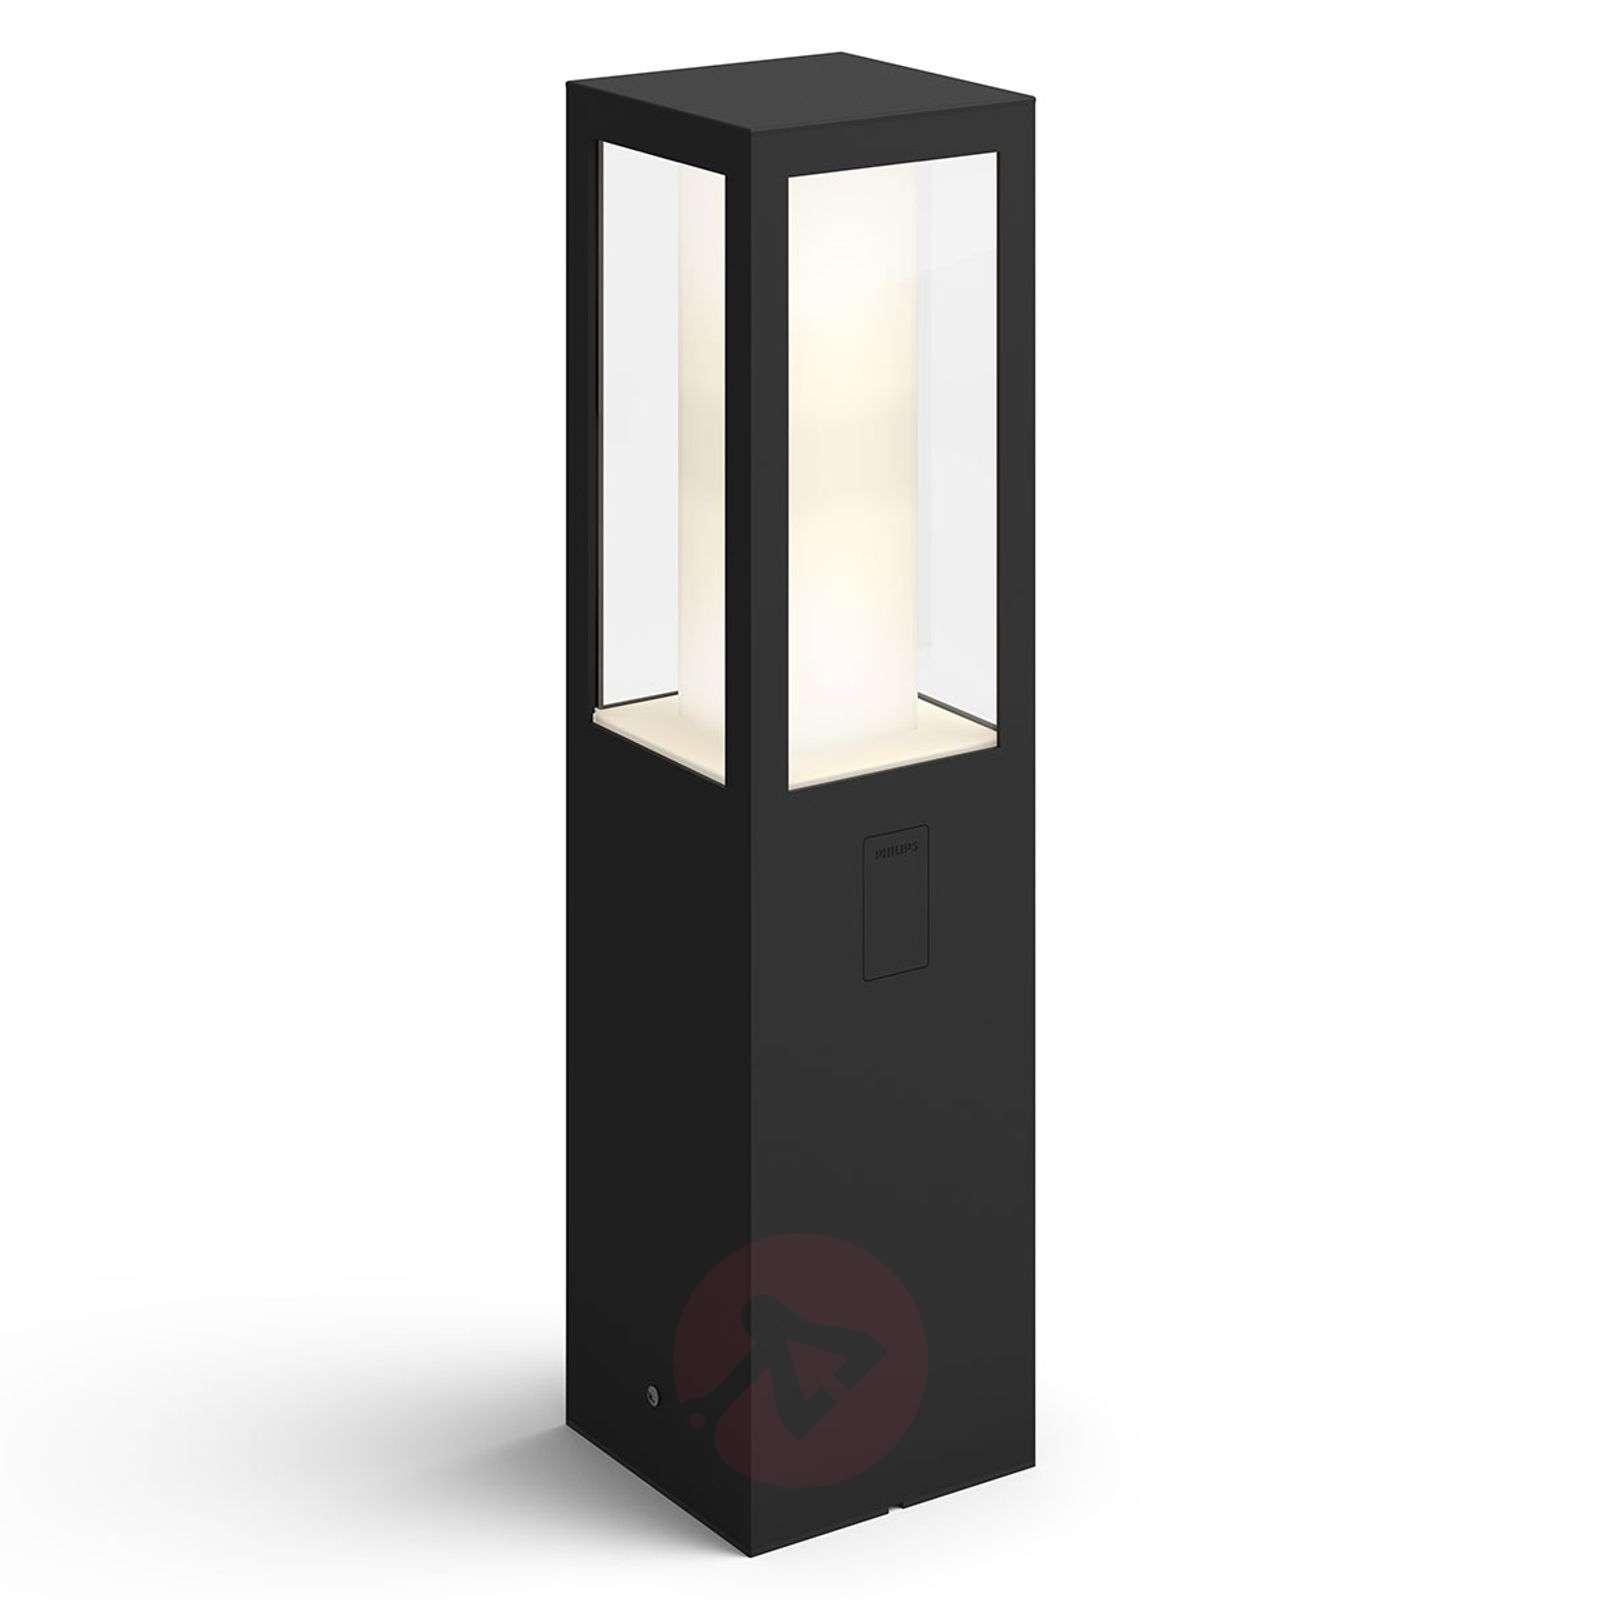 Philips Hue Impress pillar light extension set-7534112-02